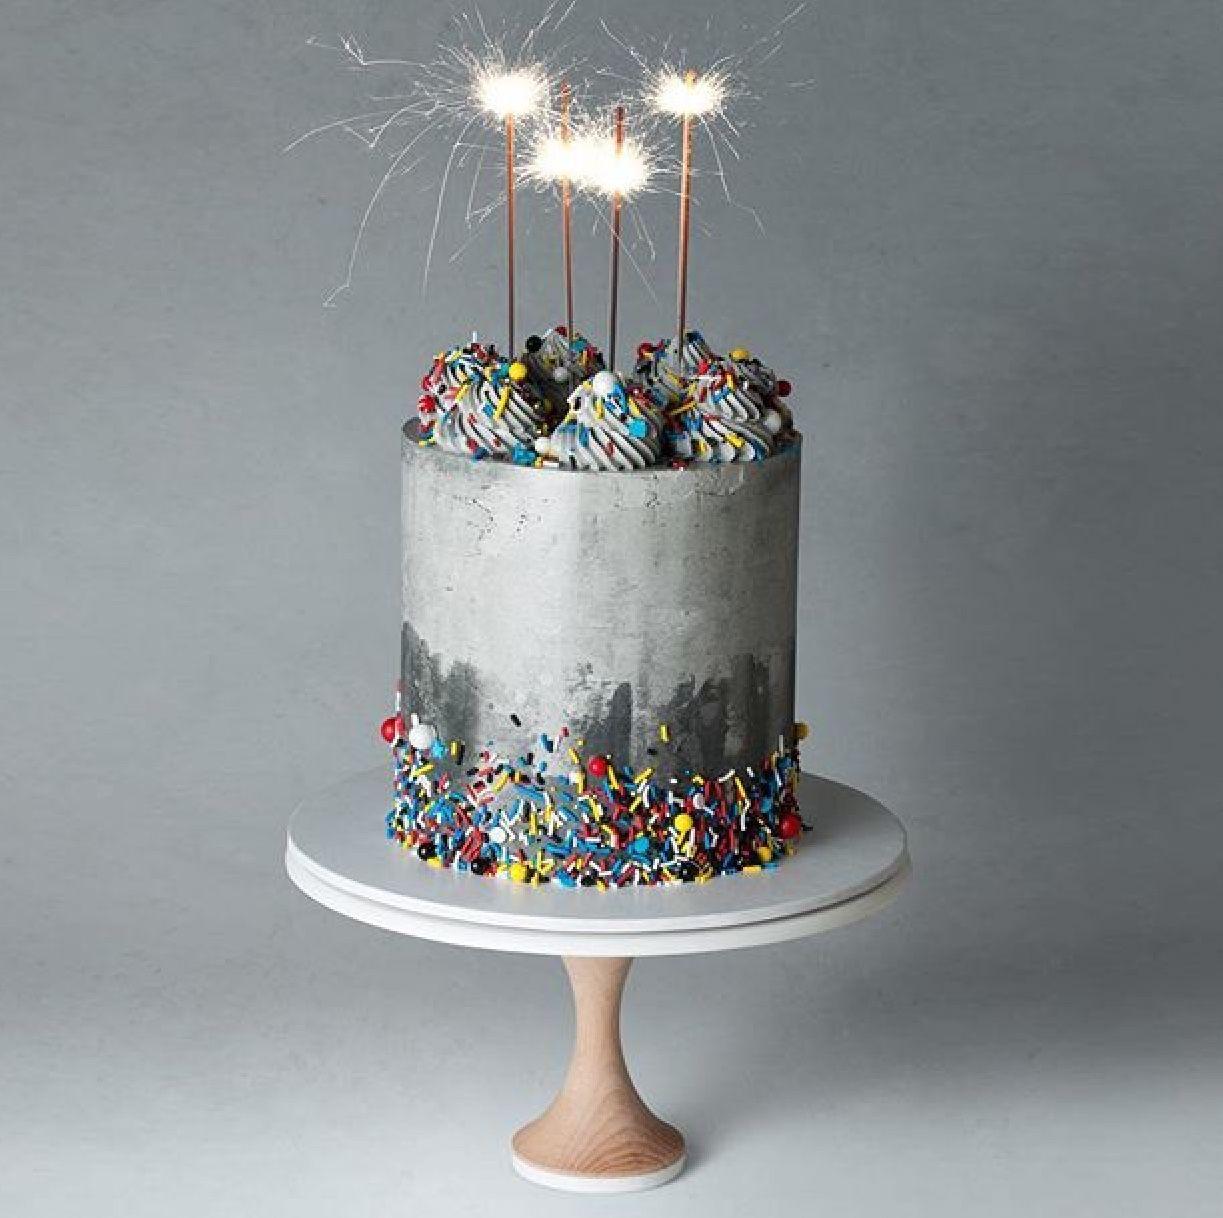 Pleasant Gorgeous Man Cake With Images Birthday Cupcakes Decoration Funny Birthday Cards Online Inifodamsfinfo